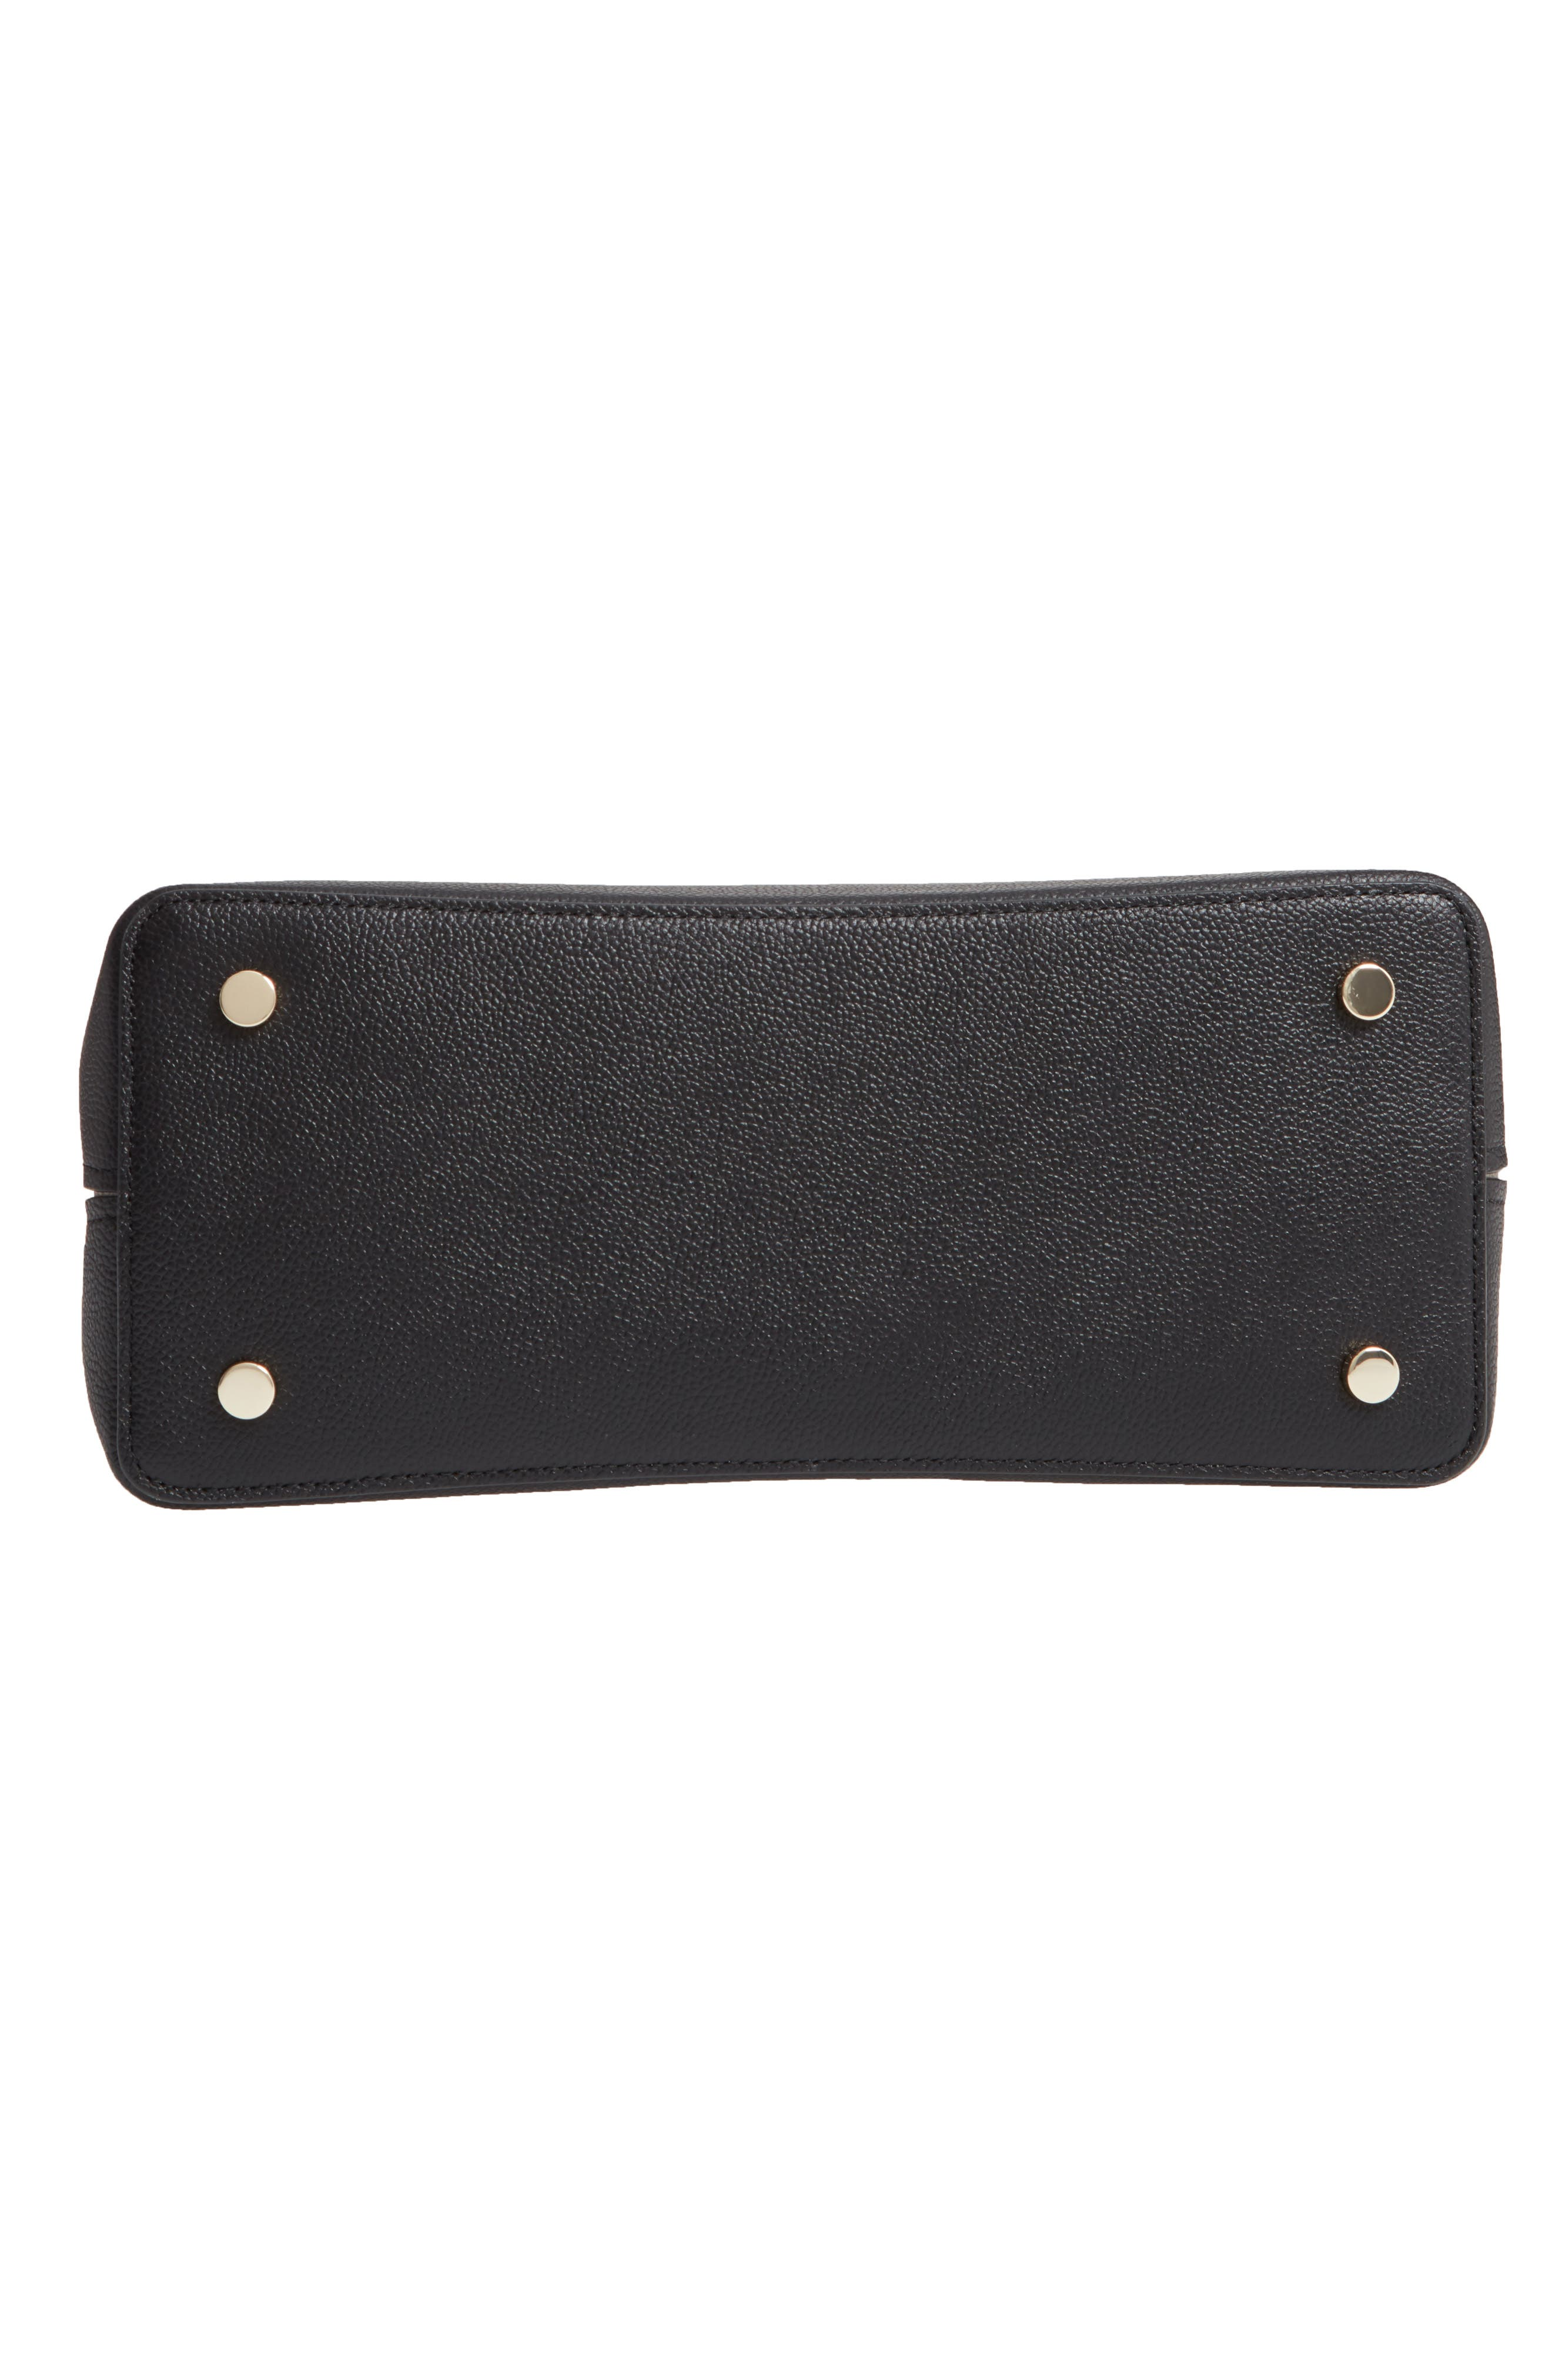 KATE SPADE NEW YORK, large margaux leather satchel, Alternate thumbnail 7, color, BLACK/ WARM TAUPE